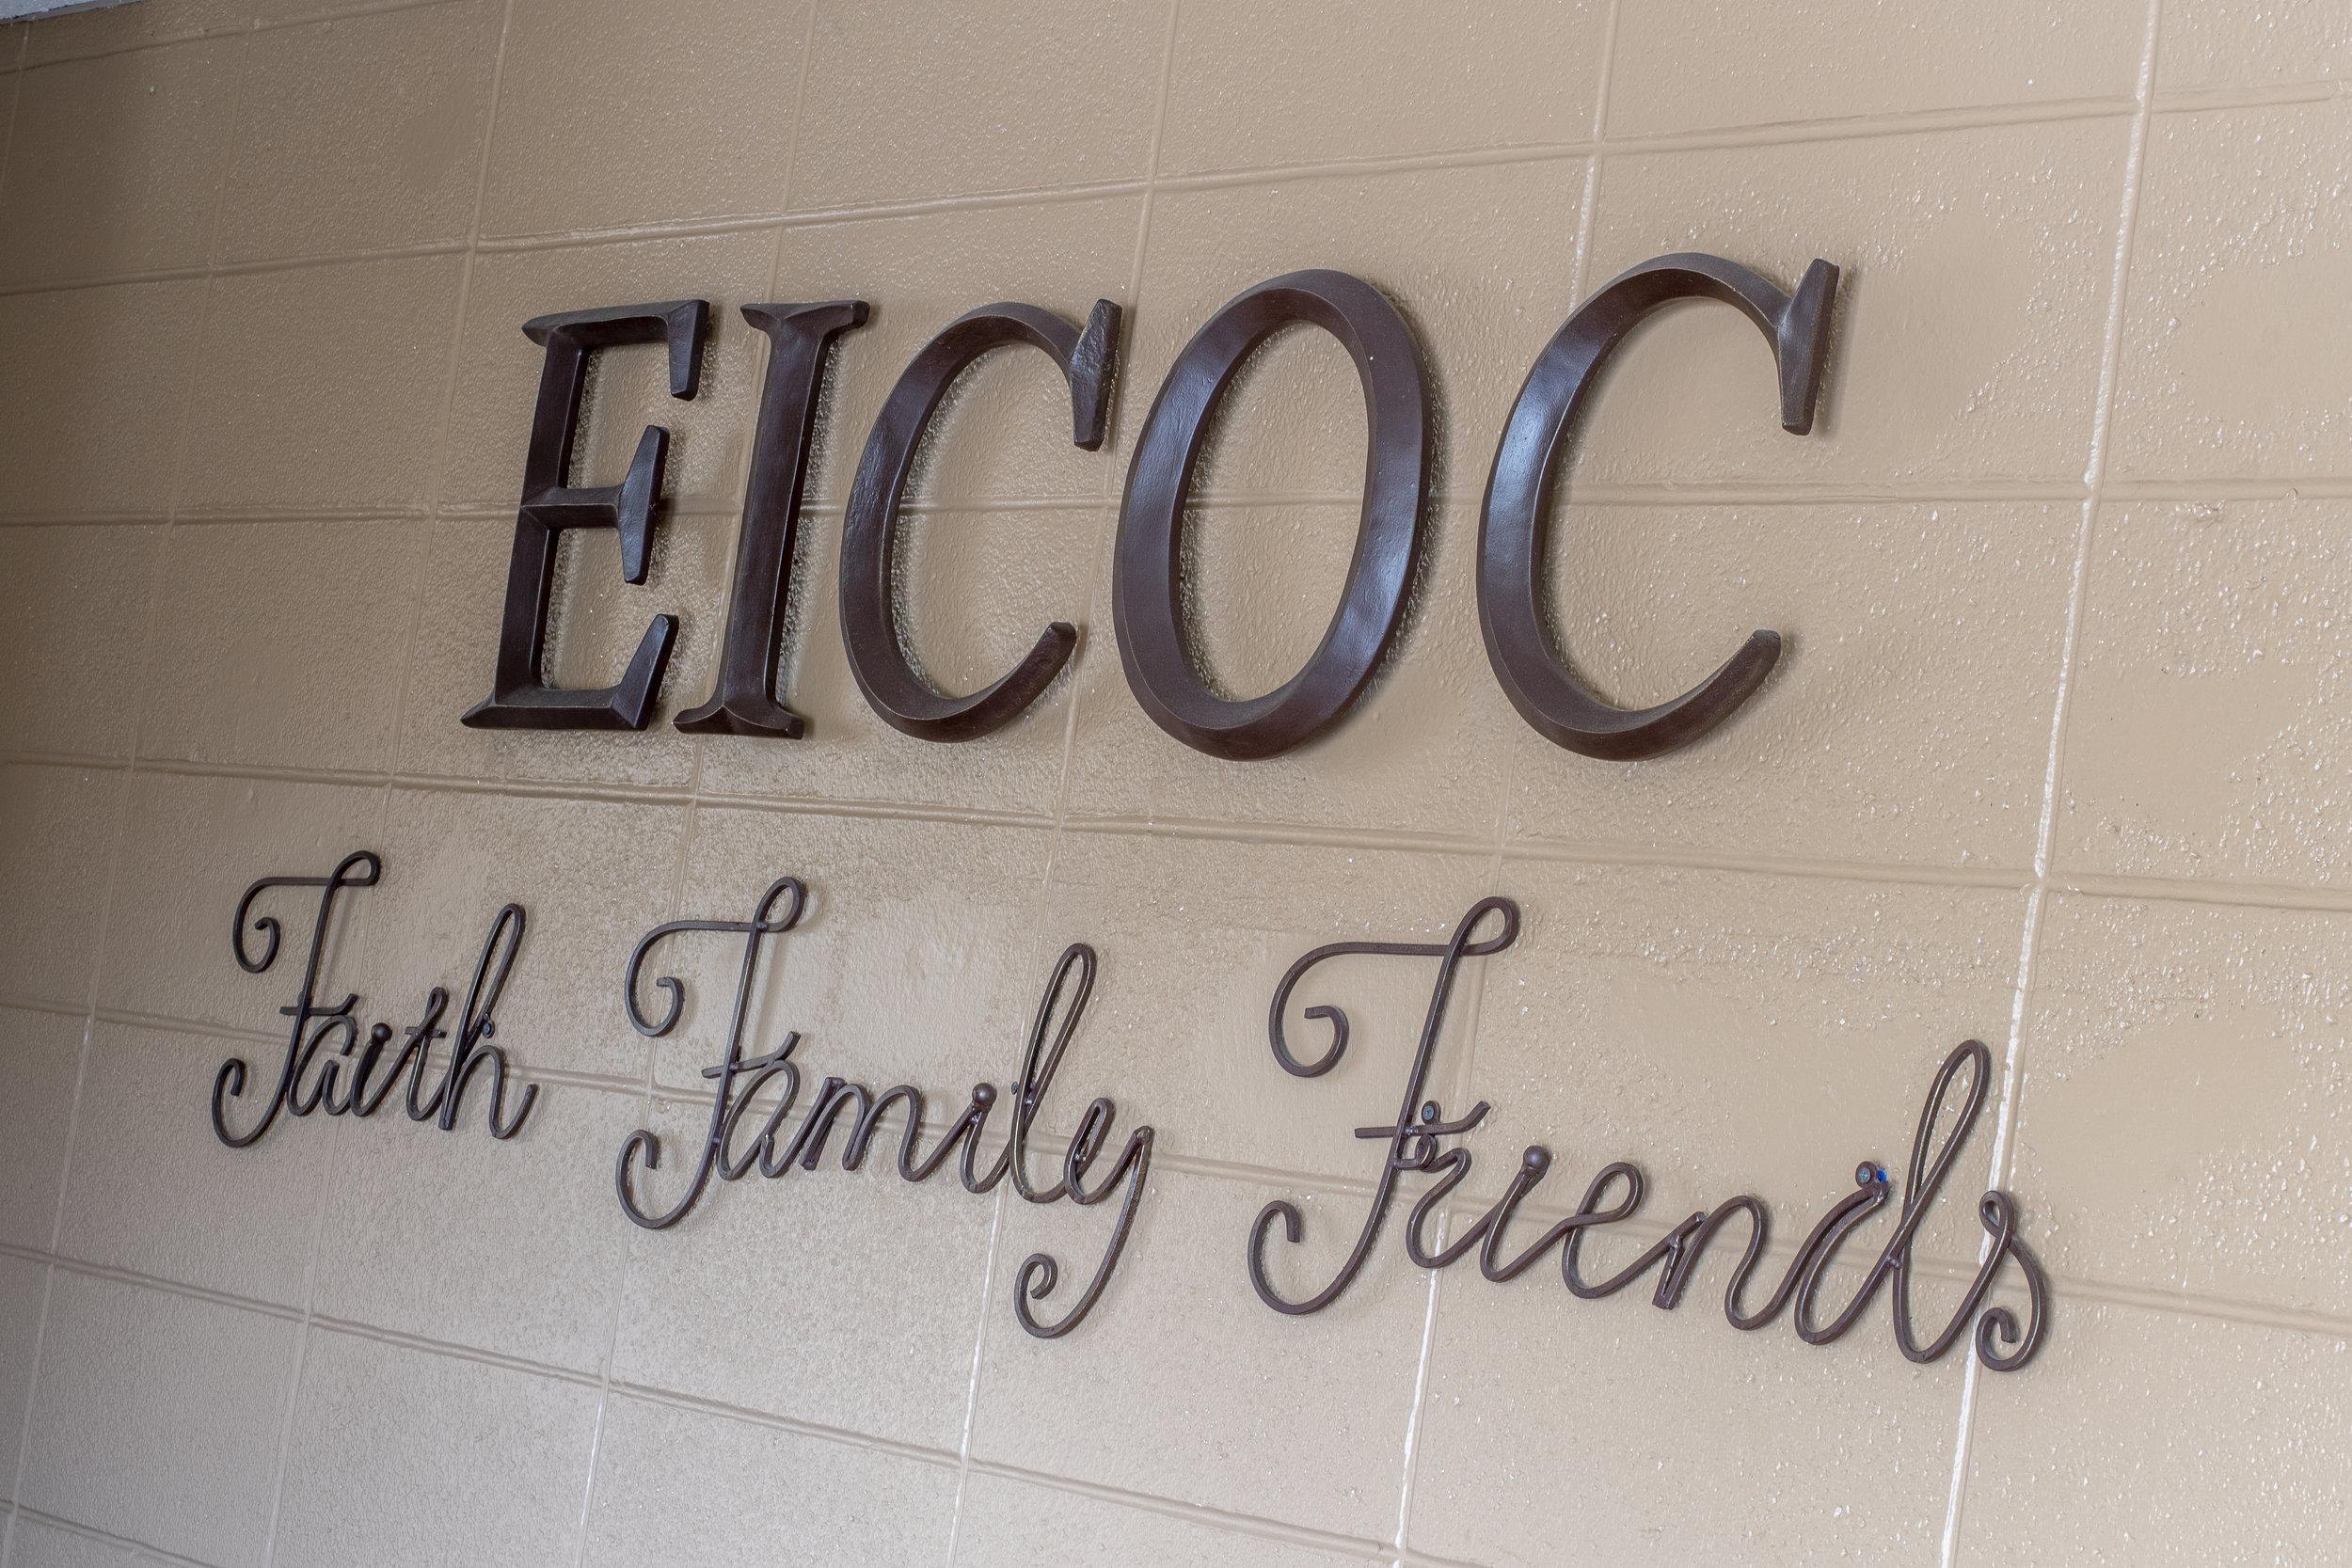 eicoc-fourty-hours-of-prayer_27882841607_o.jpg